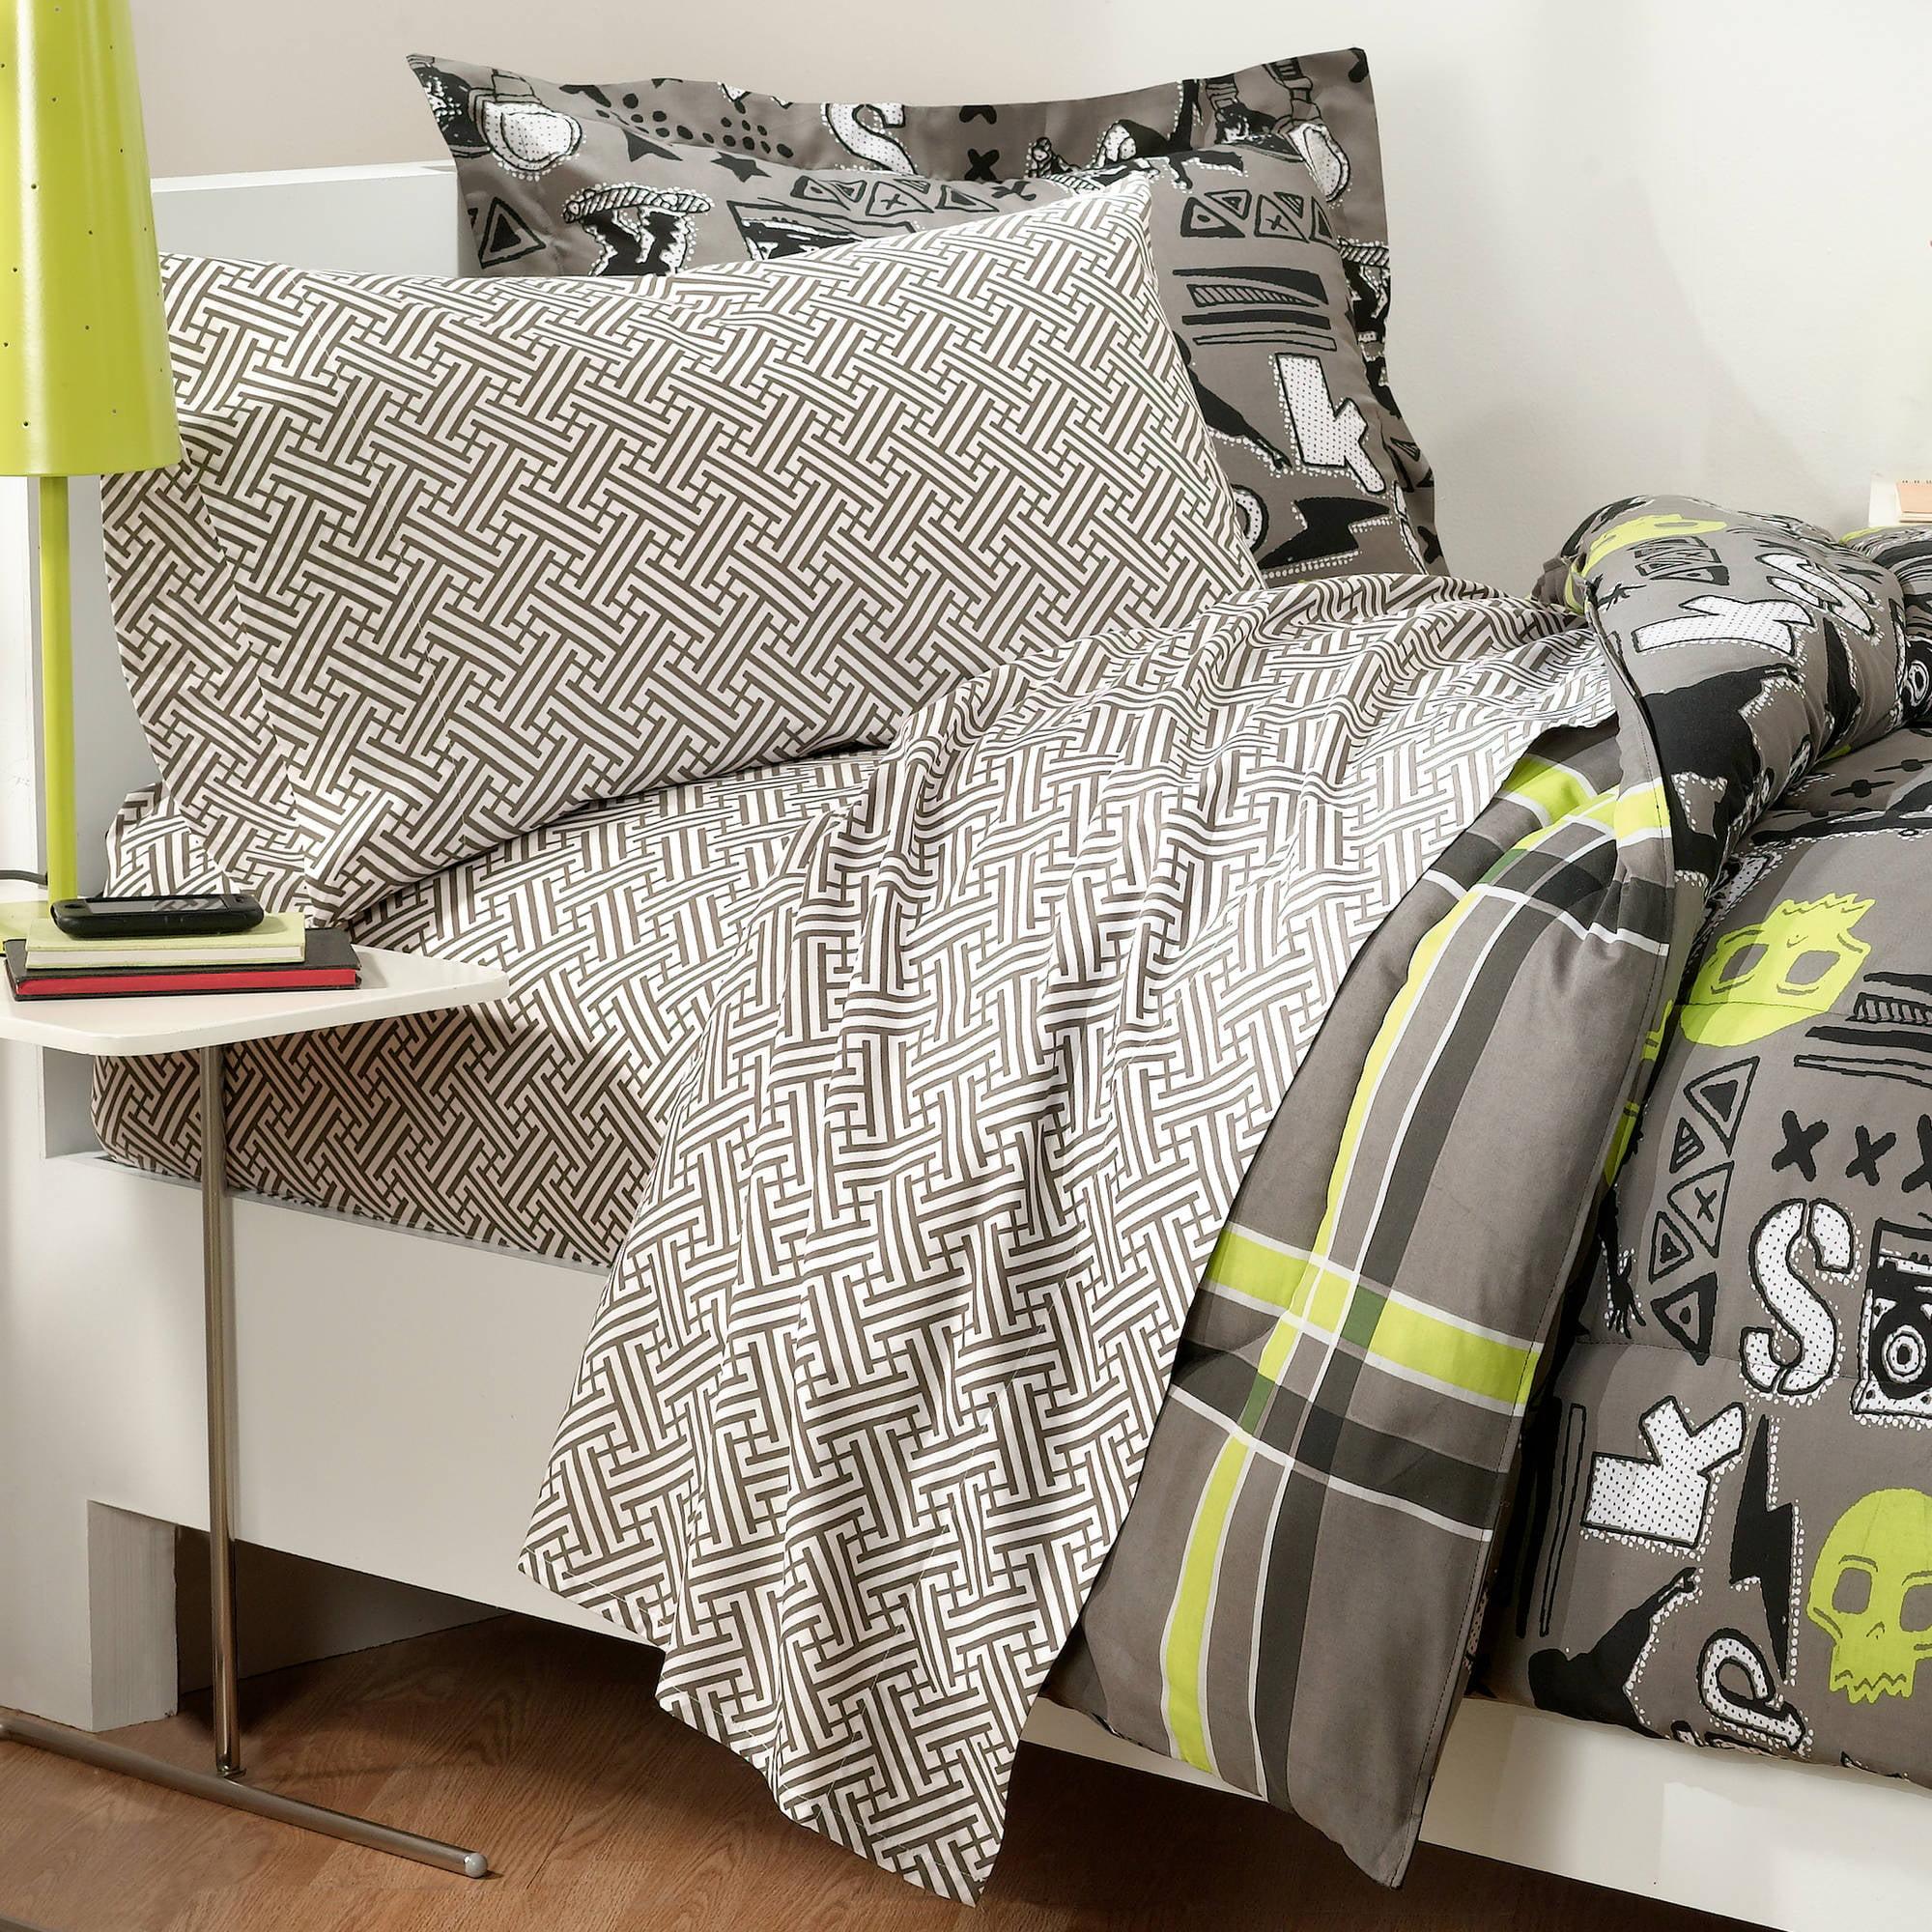 Comforter Full Size Bedding Set Kids Boys Bed In A Bag Reversible Bedroom  Cover